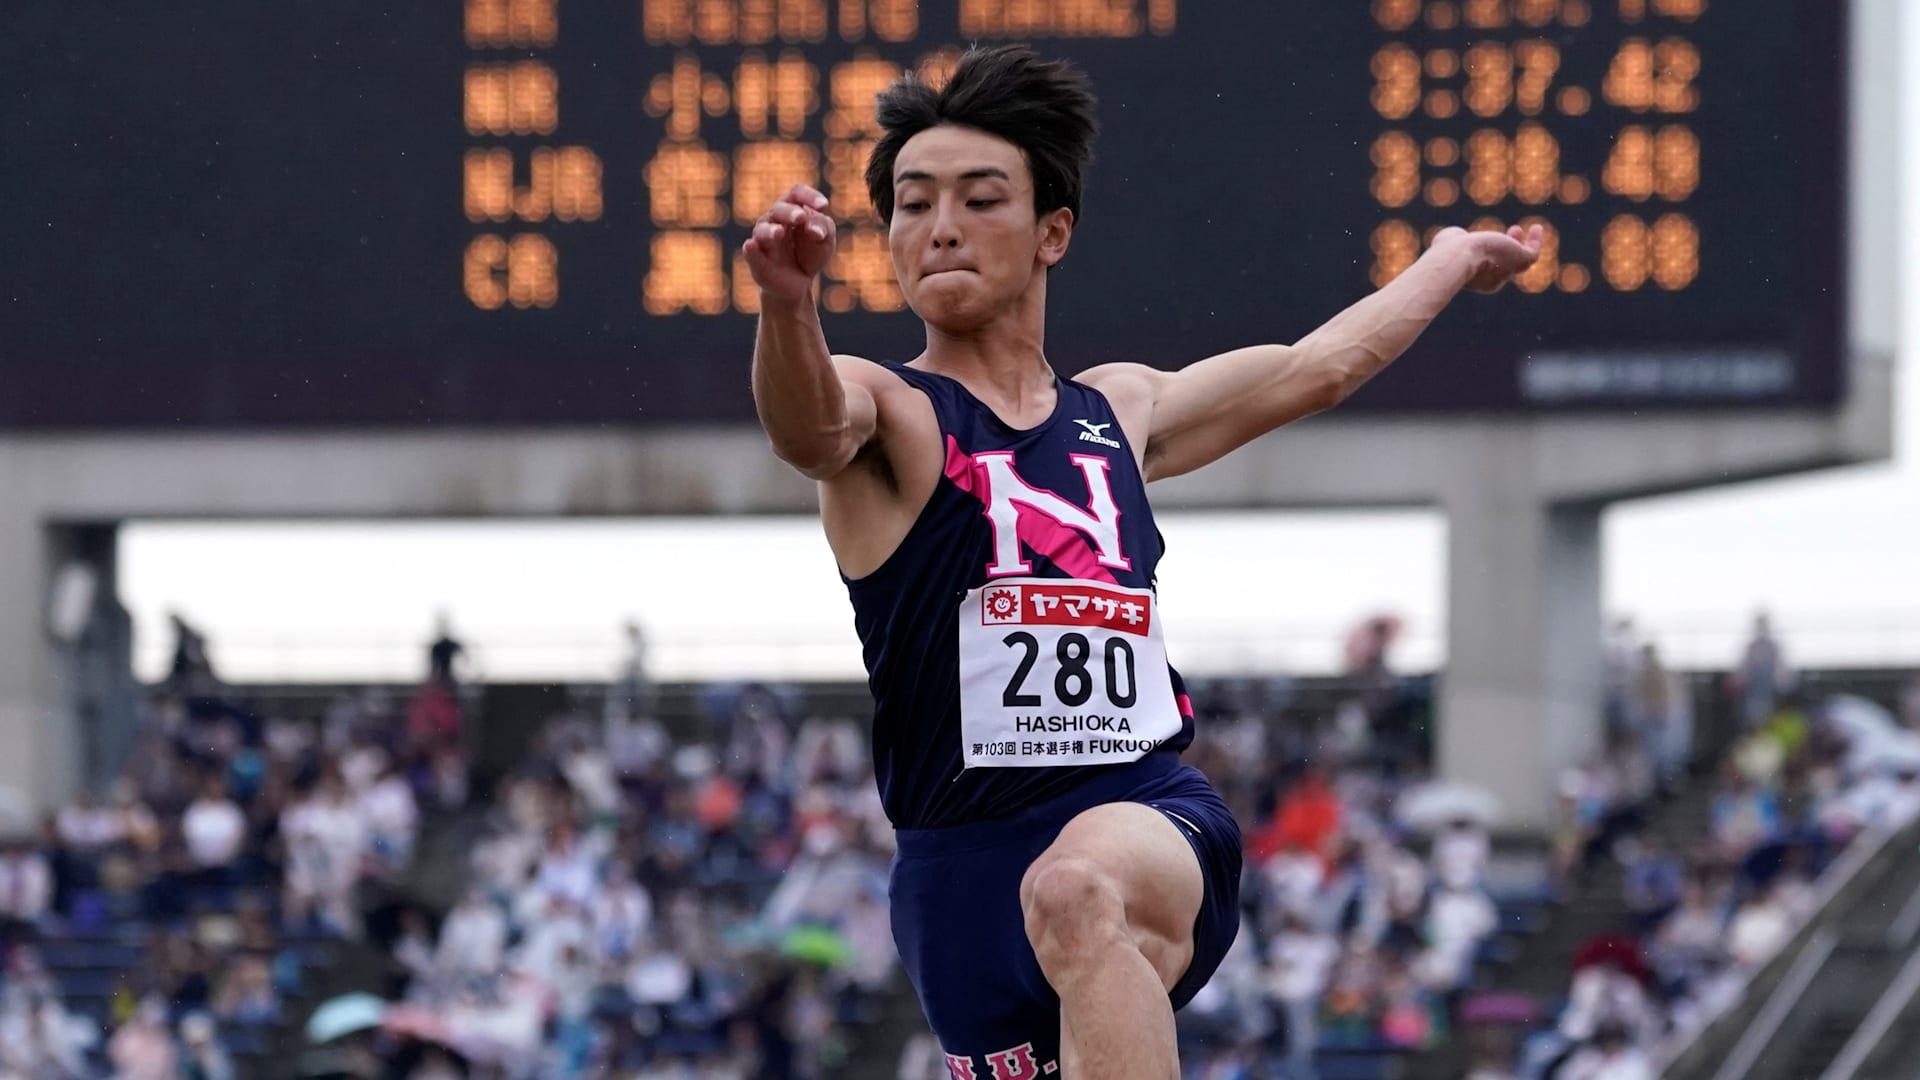 第89回日本学生陸上競技対校選手権大会・1日目結果:男子走り幅跳びは ...